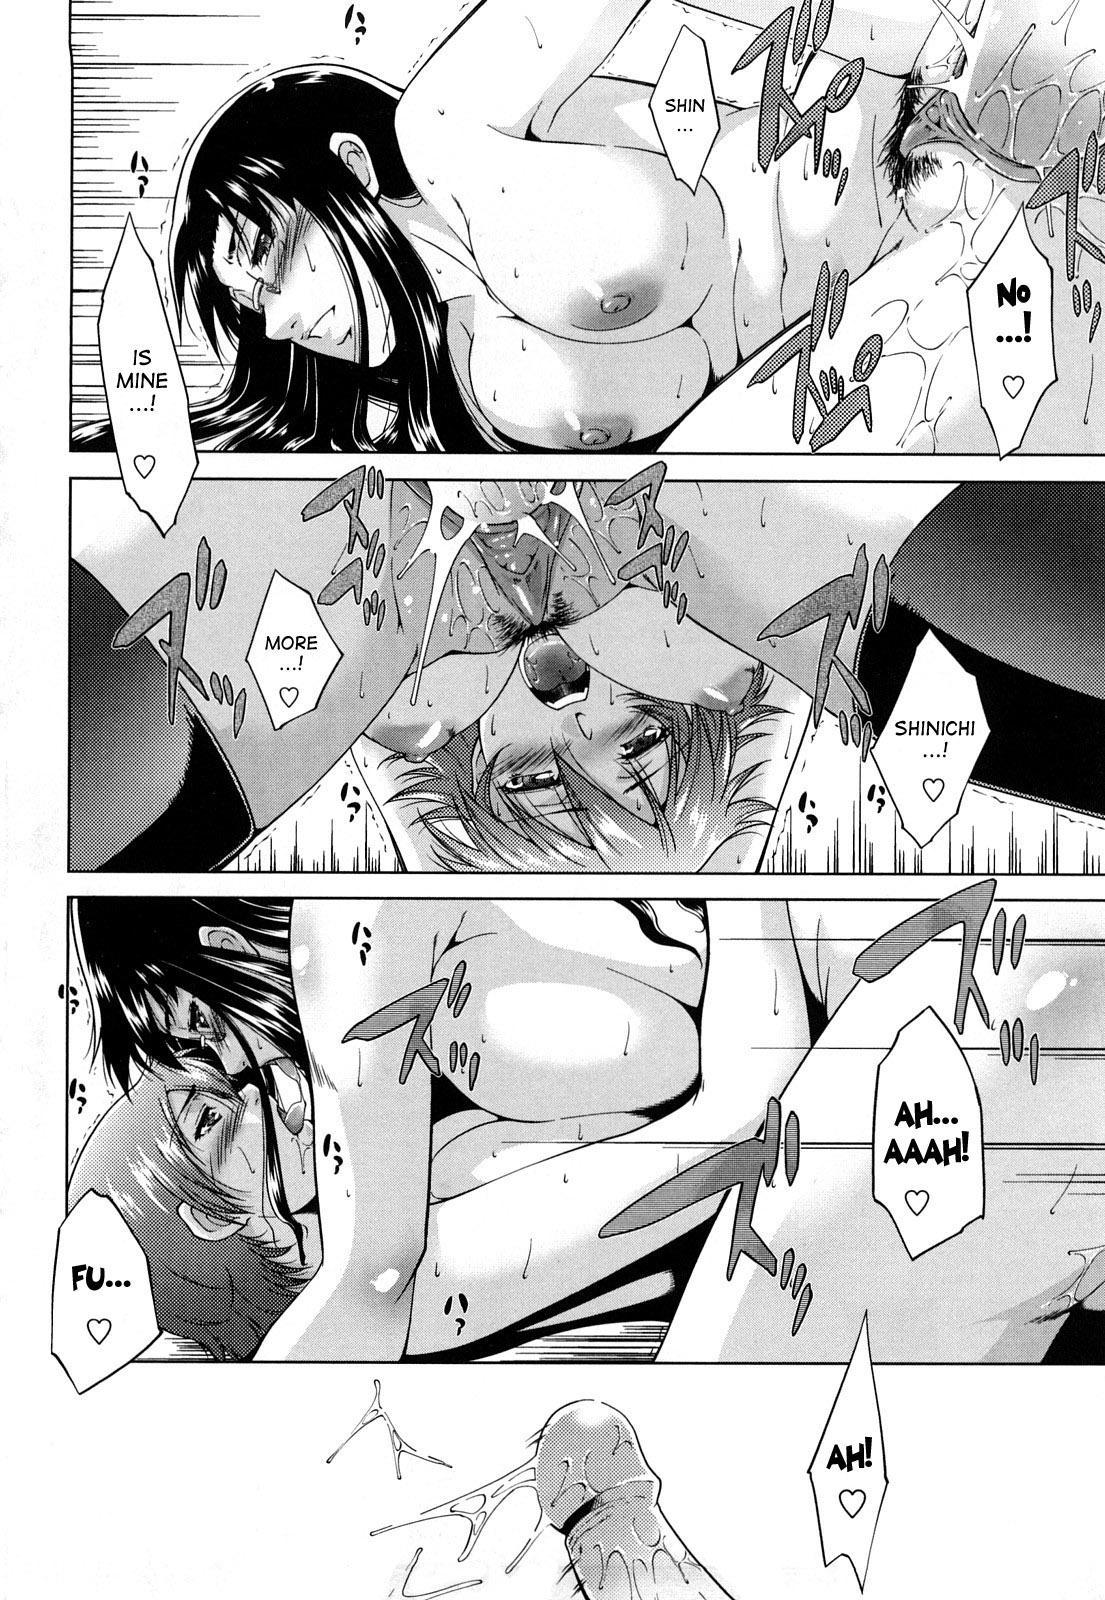 [Touma Itsuki] Ane-sama Inkou - Sister's Sexy Smell Ch. 1-6 [English] [desudesu] [Decensored] 81